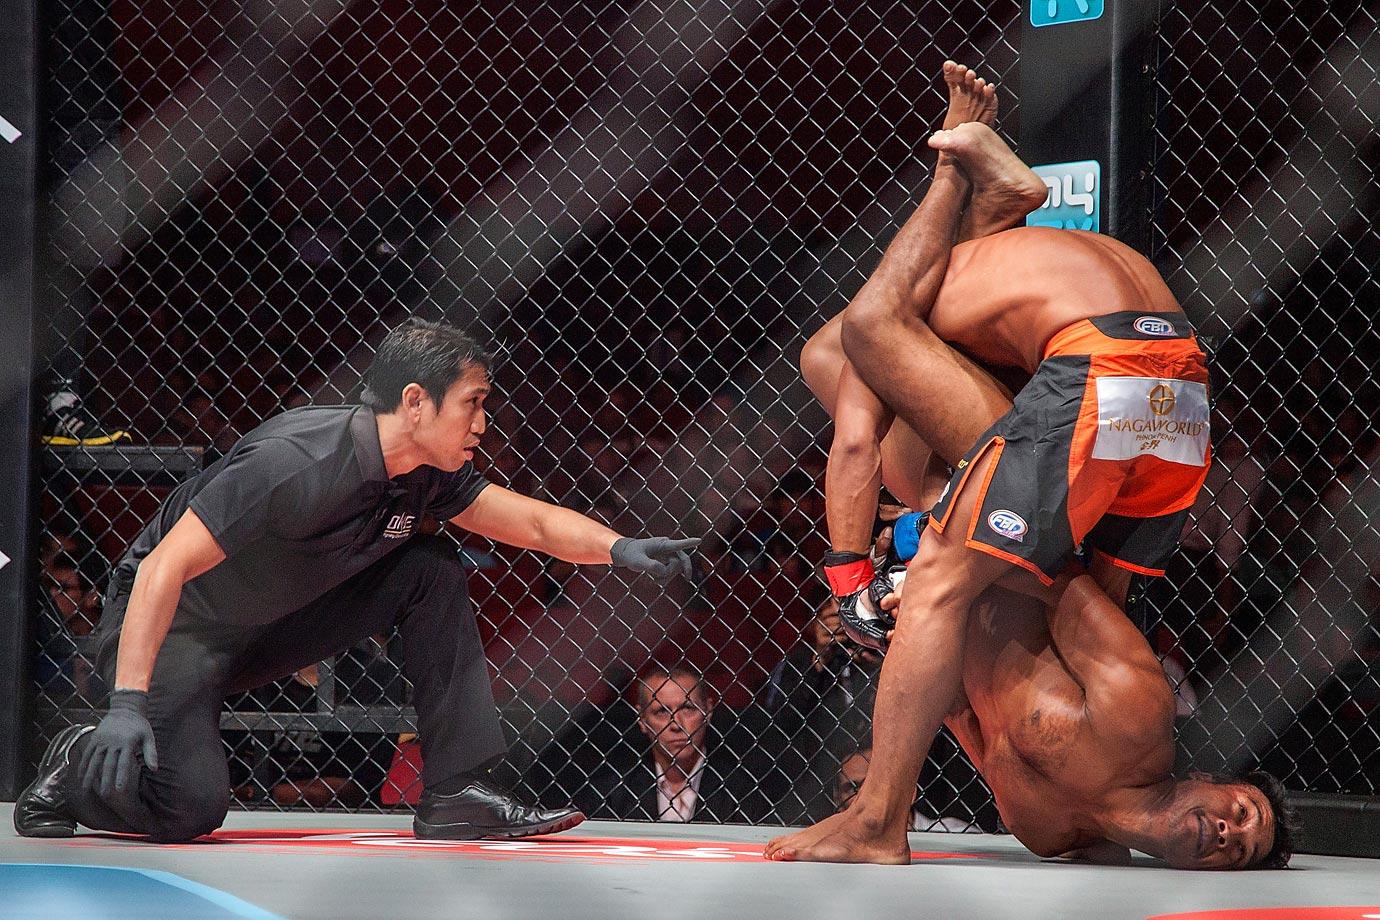 Sam Ang Dun (top) competing against Chin Heng.